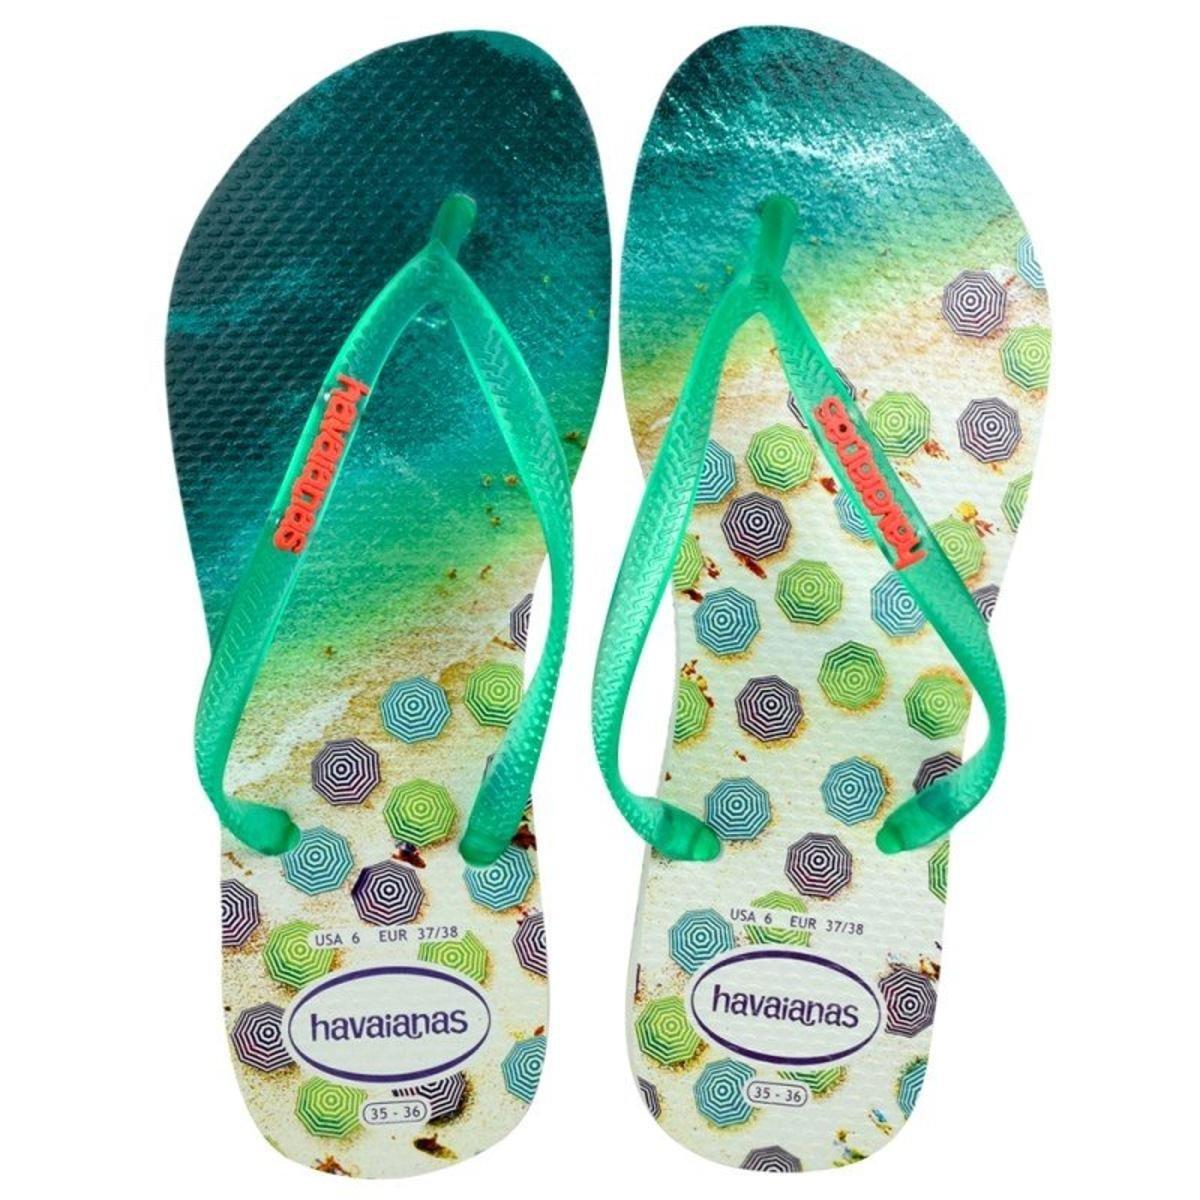 competitive price c0c4a af0c0 Chinelo Havaianas Slim Paisage Feminino - Branco e Verde